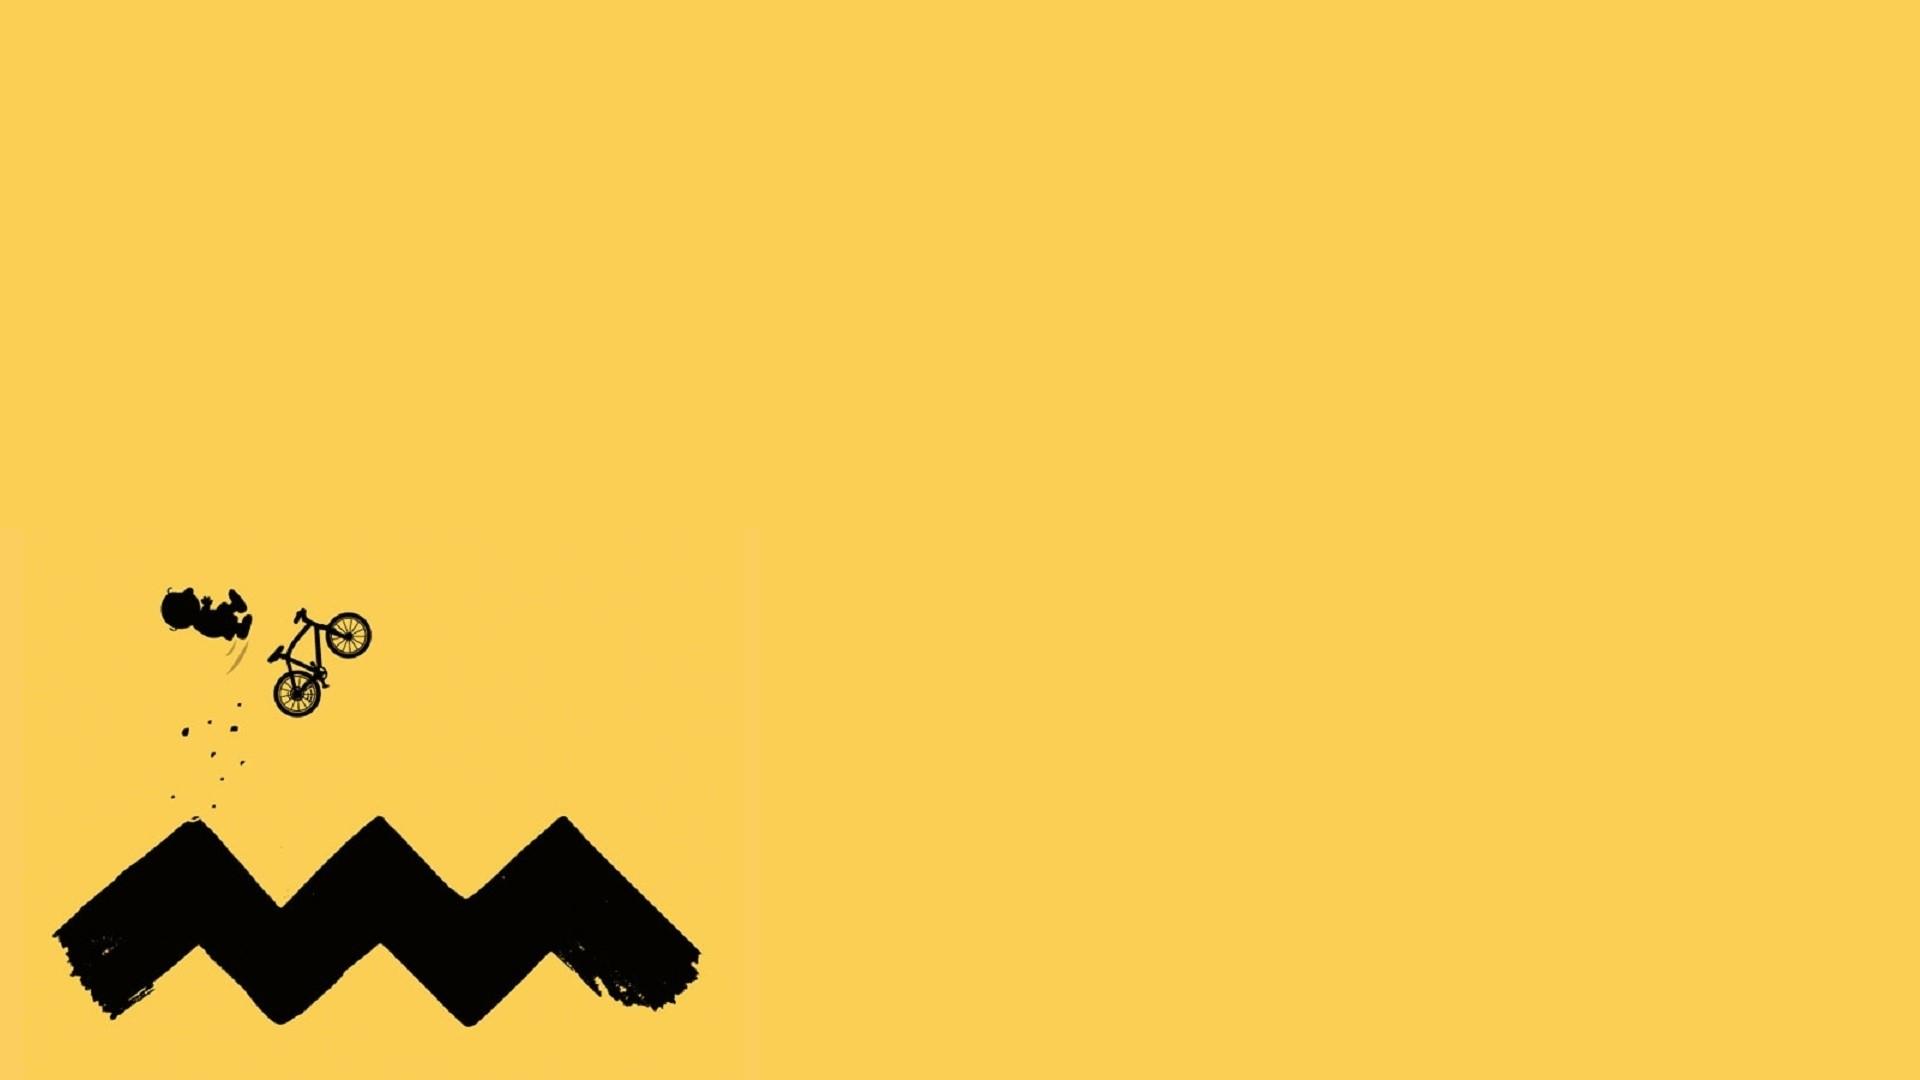 Fondos De Pantalla Ilustración Minimalismo Texto Logo